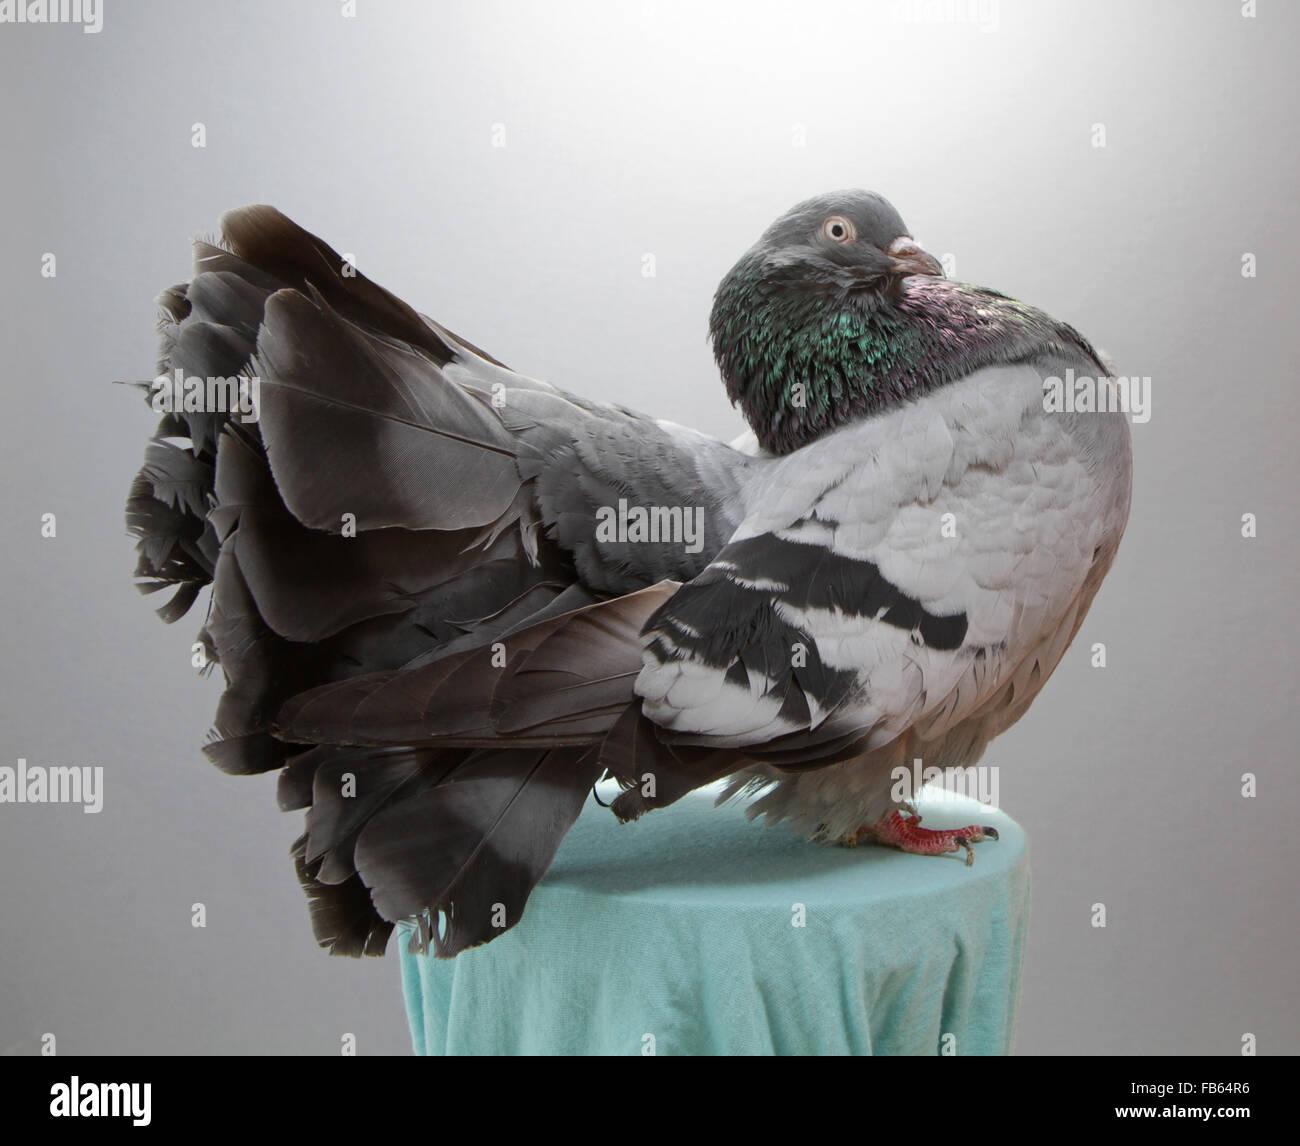 e122a95e8d1 A champion fantail pigeon